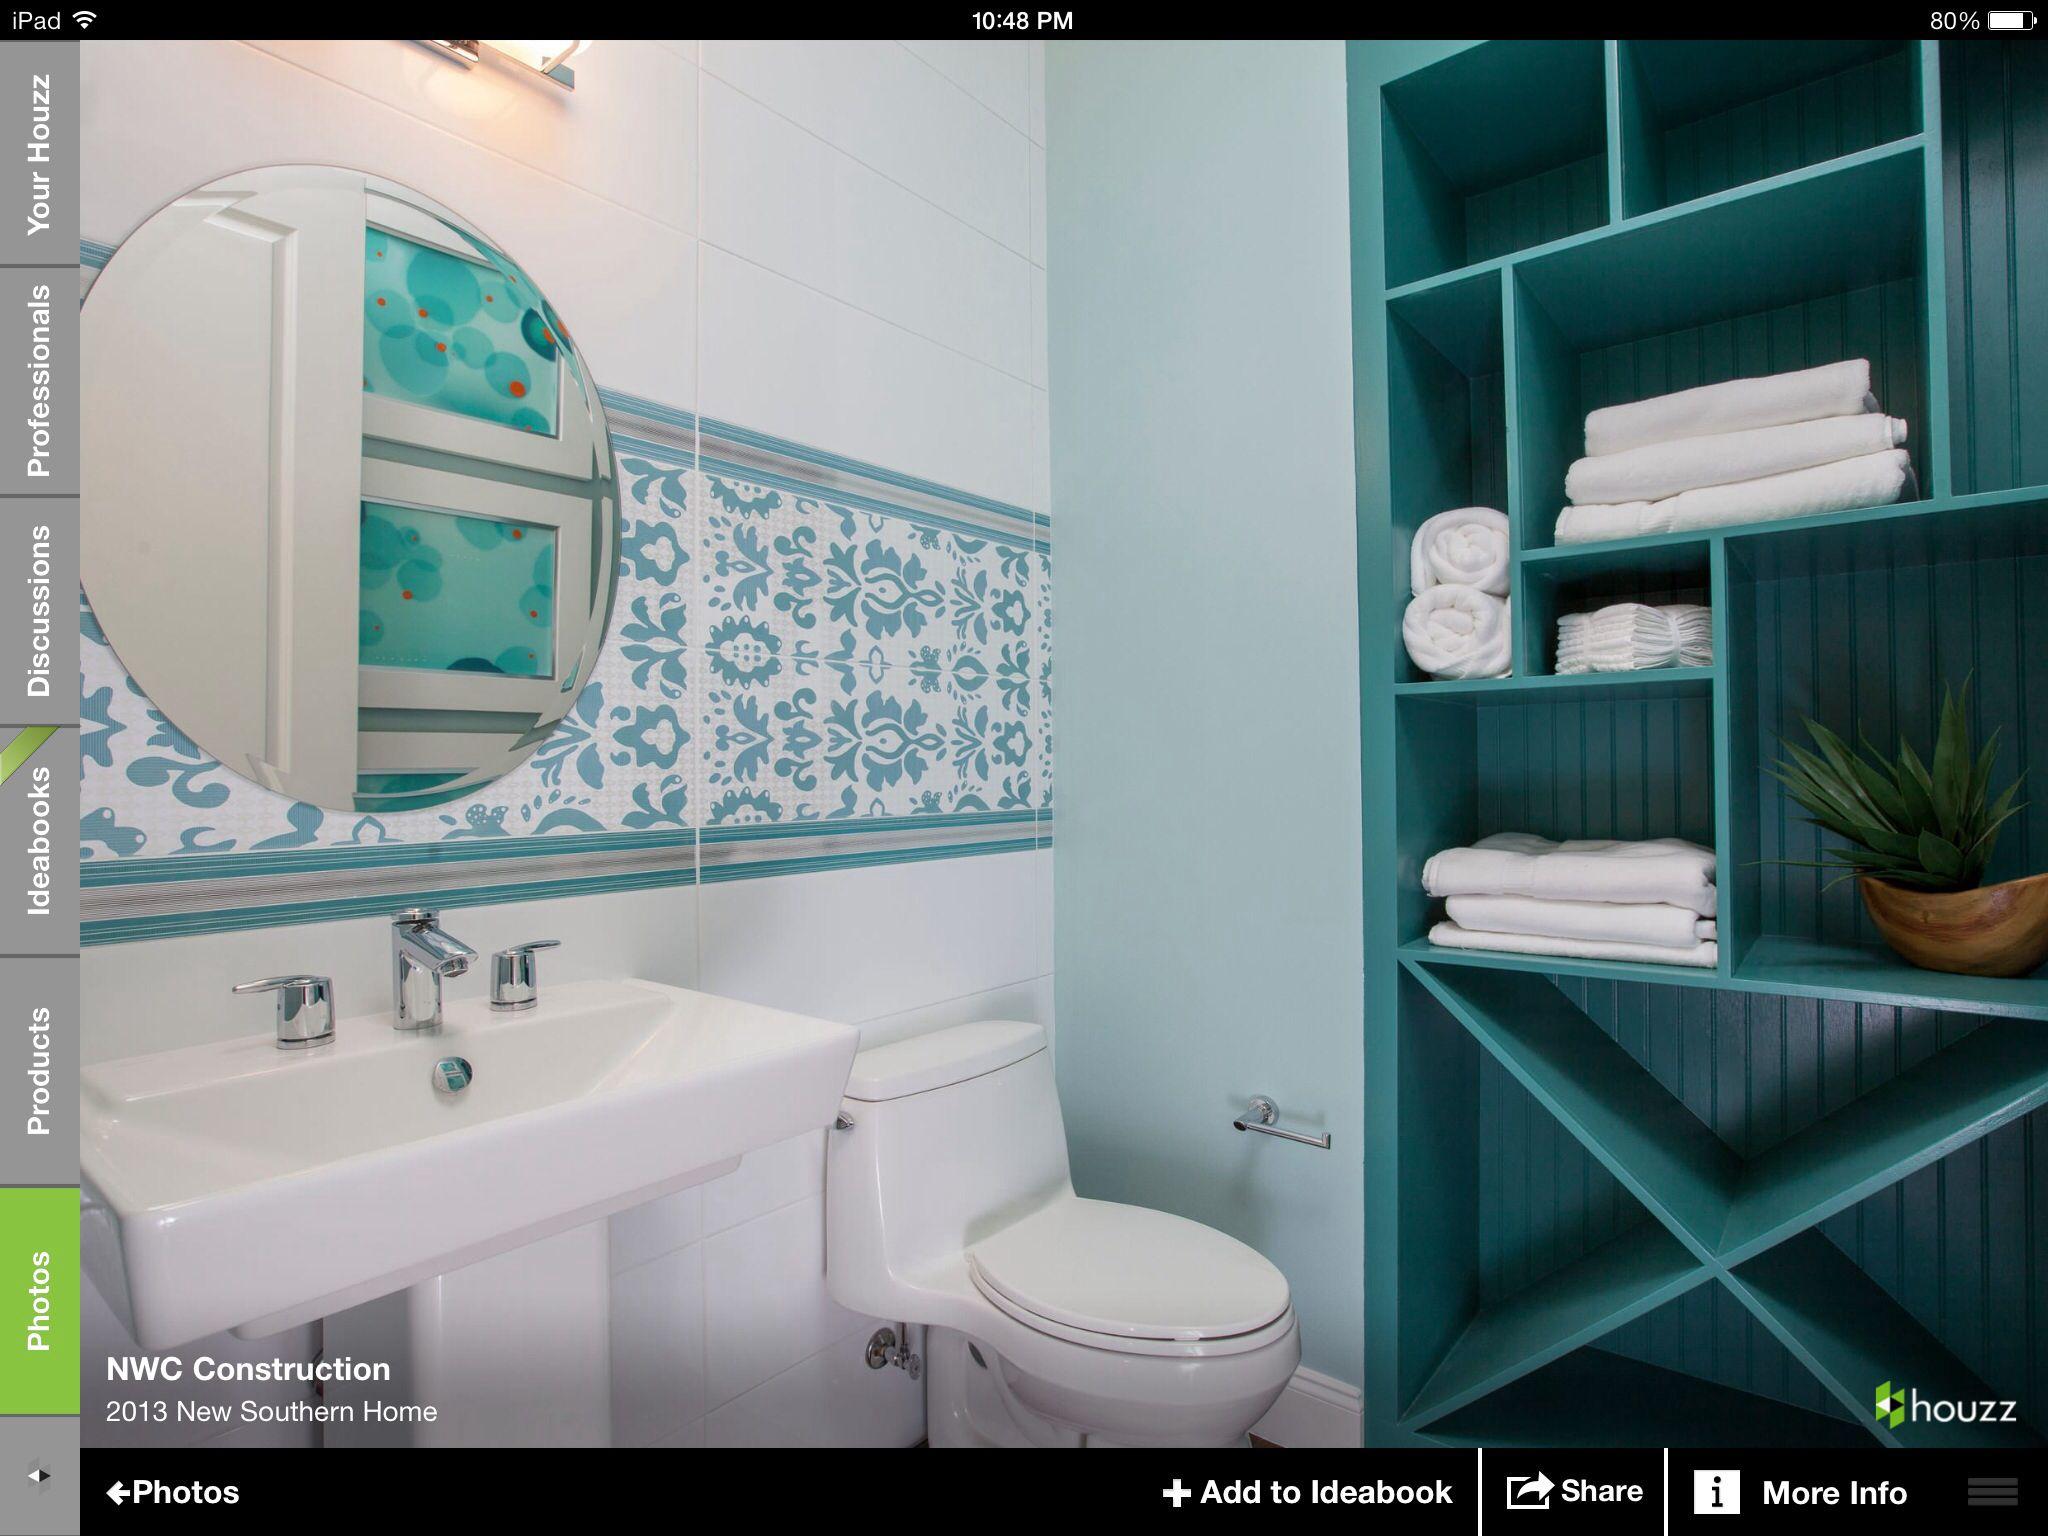 Aqua bathroom decor everything turquoise aqua pinterest for Aqua bathroom accessories